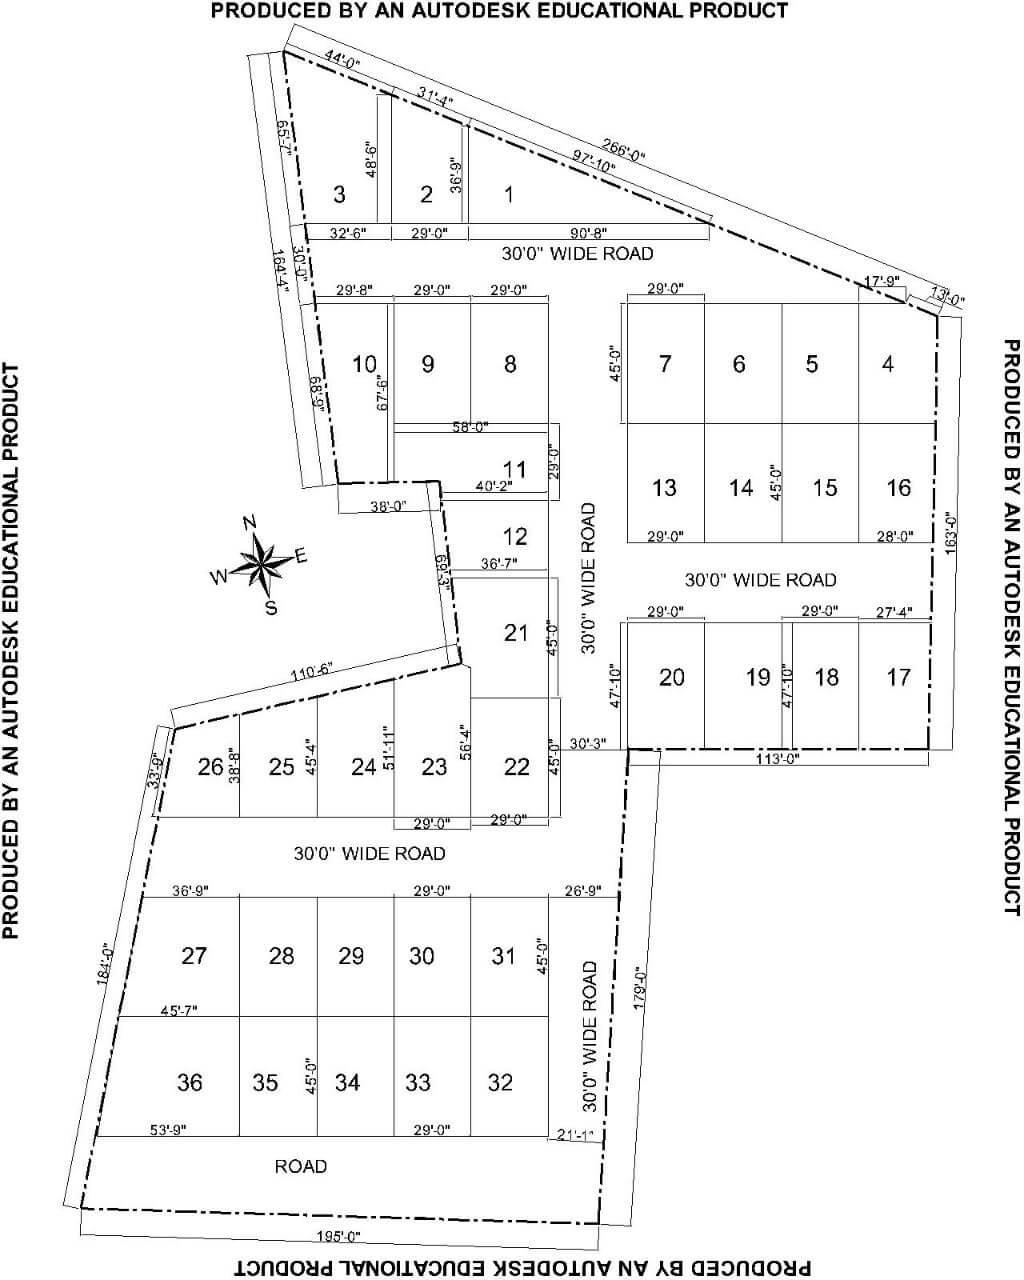 Residential Plot / Land for Sale 1200 Sq. Feet at Bhubaneswar, Sundarpada